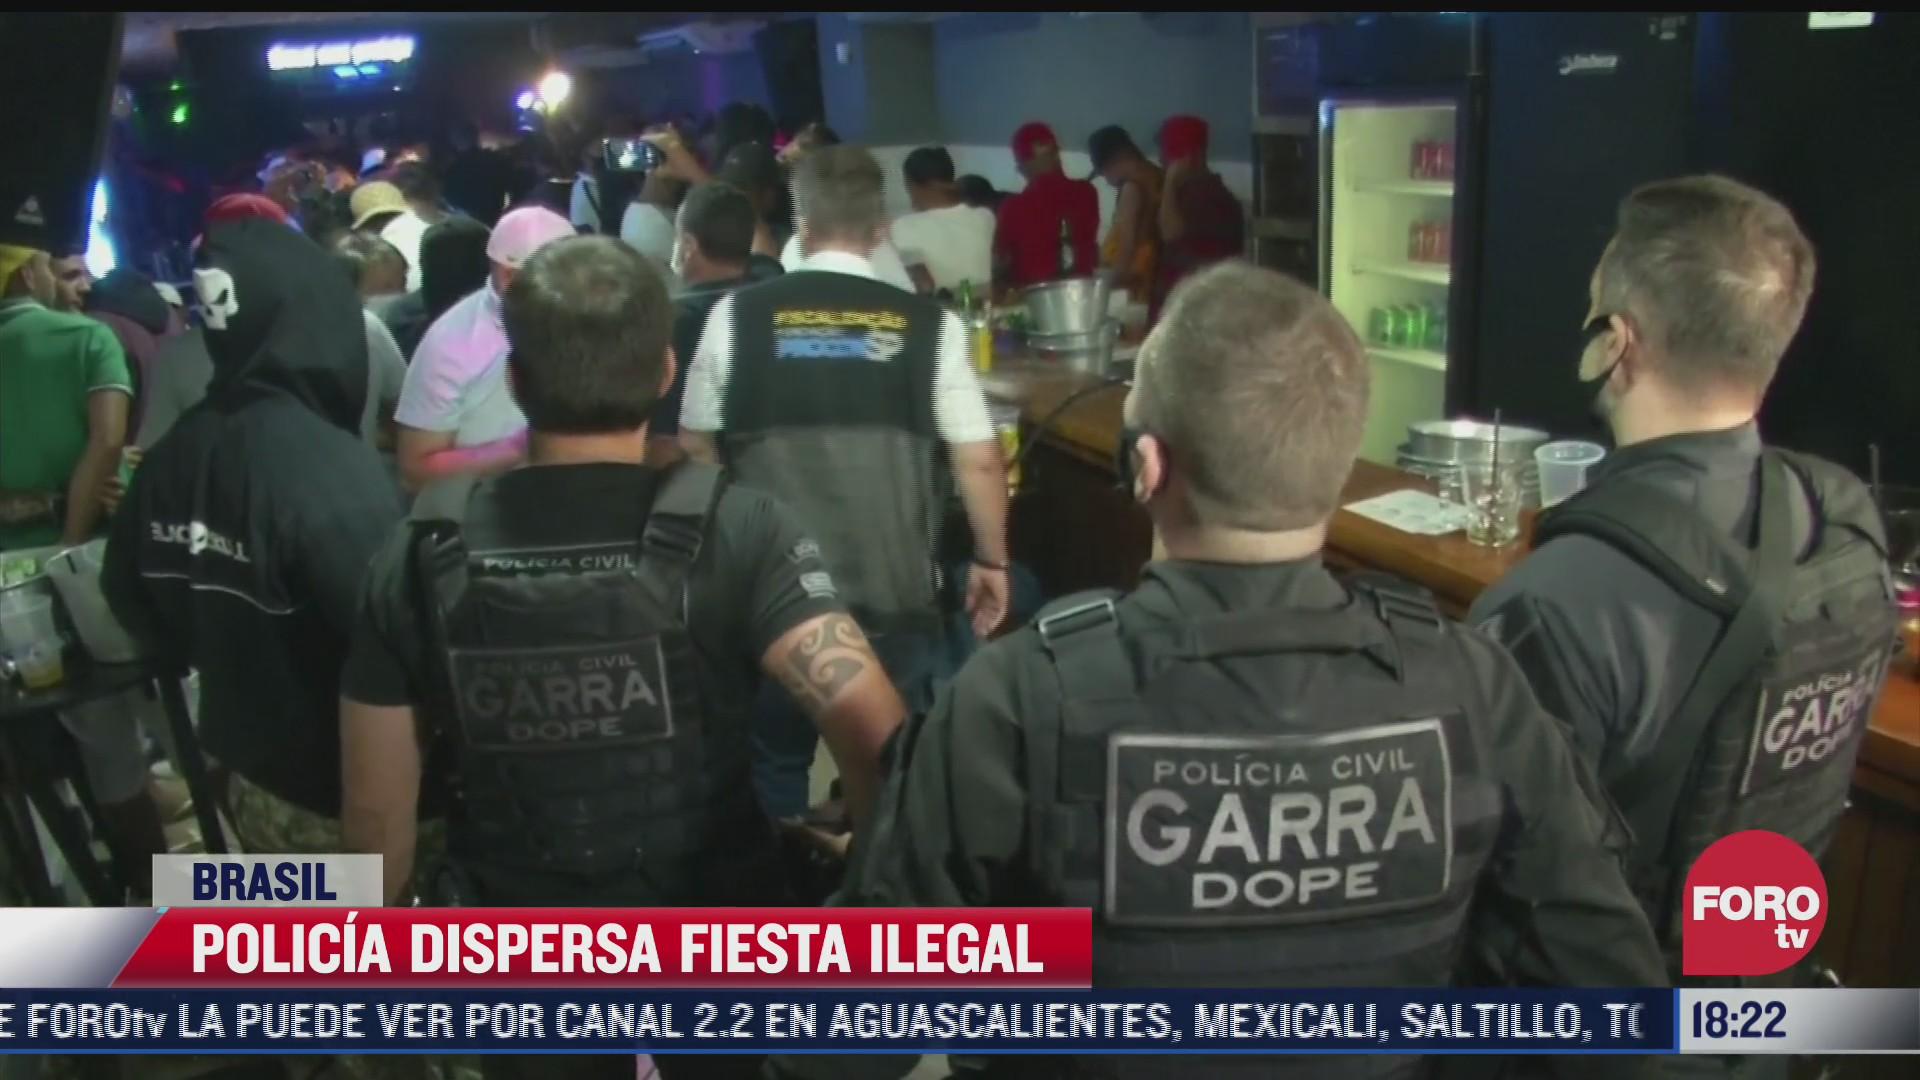 policia dispersa fiesta ilegal en brasil